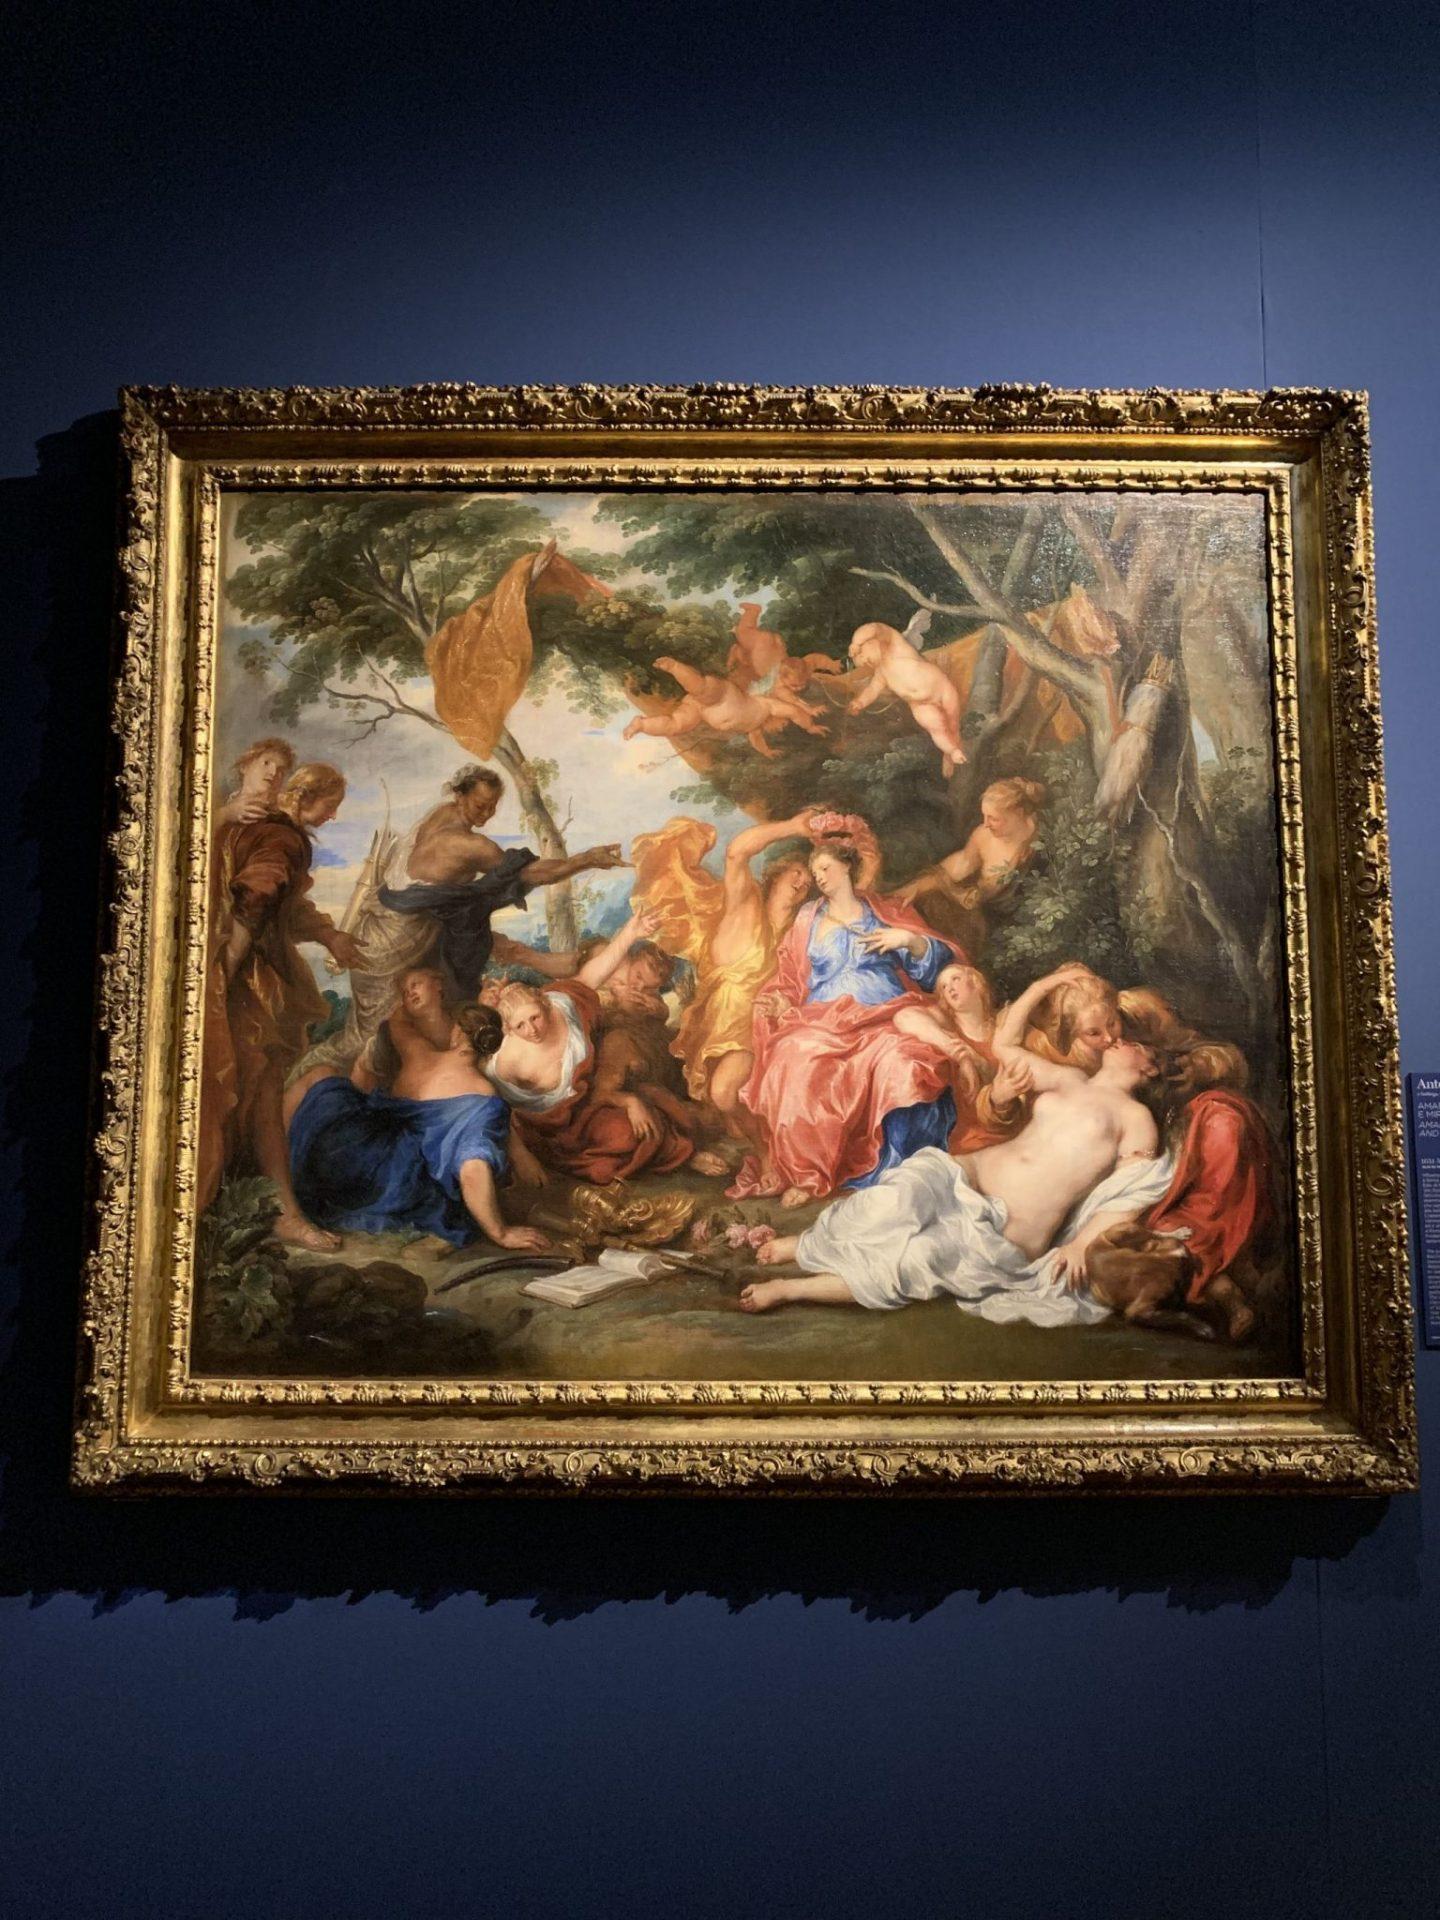 van dyck in turin art - Van Dyck in Turin